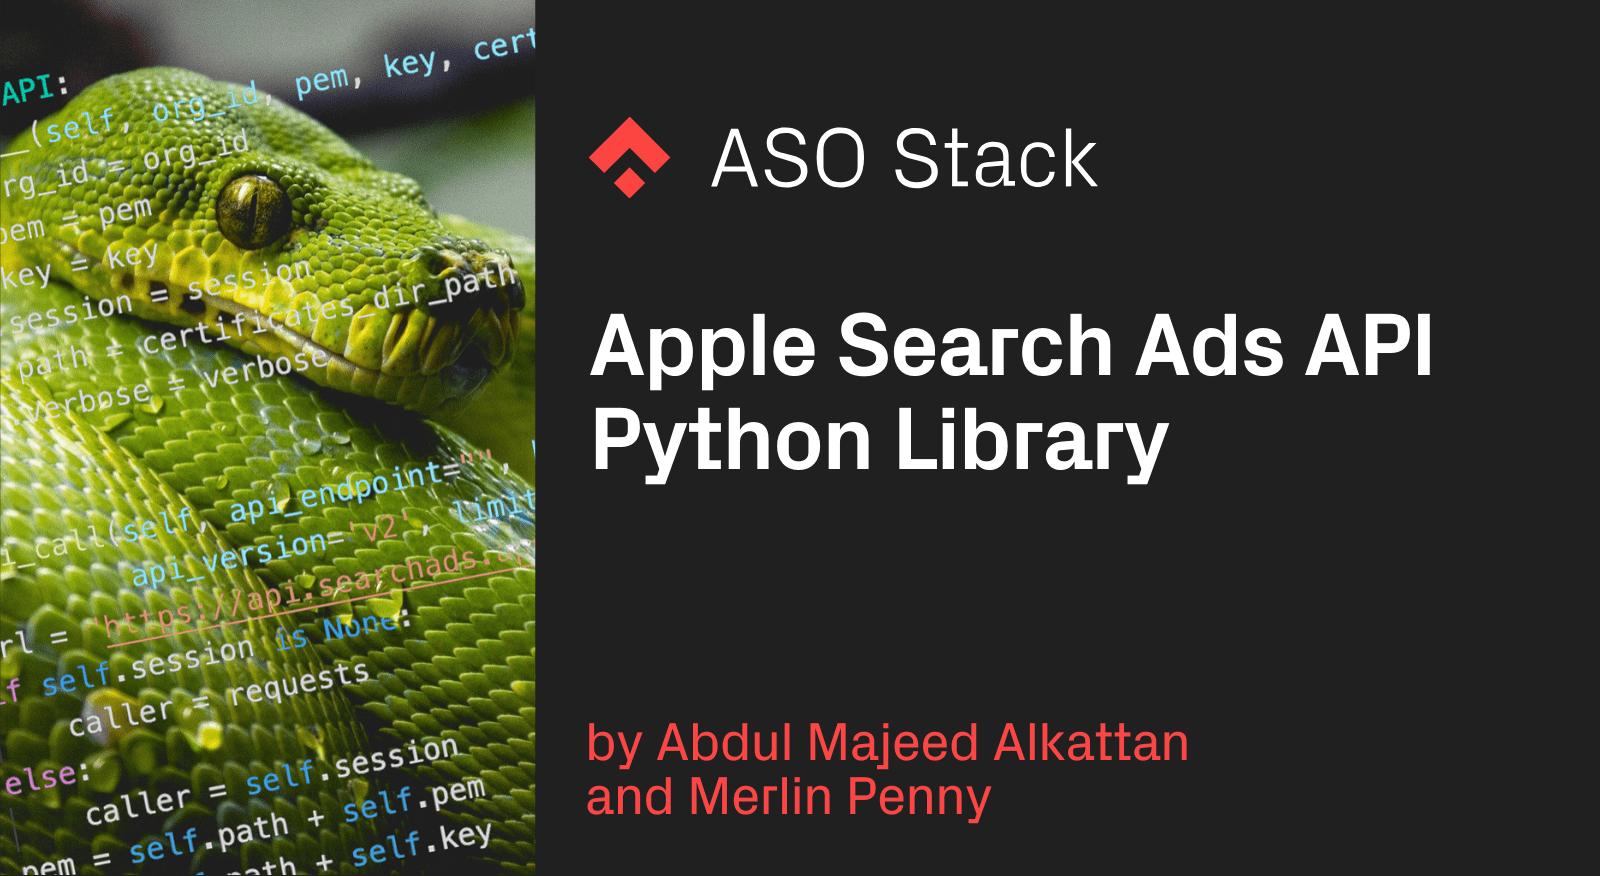 Apple Search Ads API Python Library